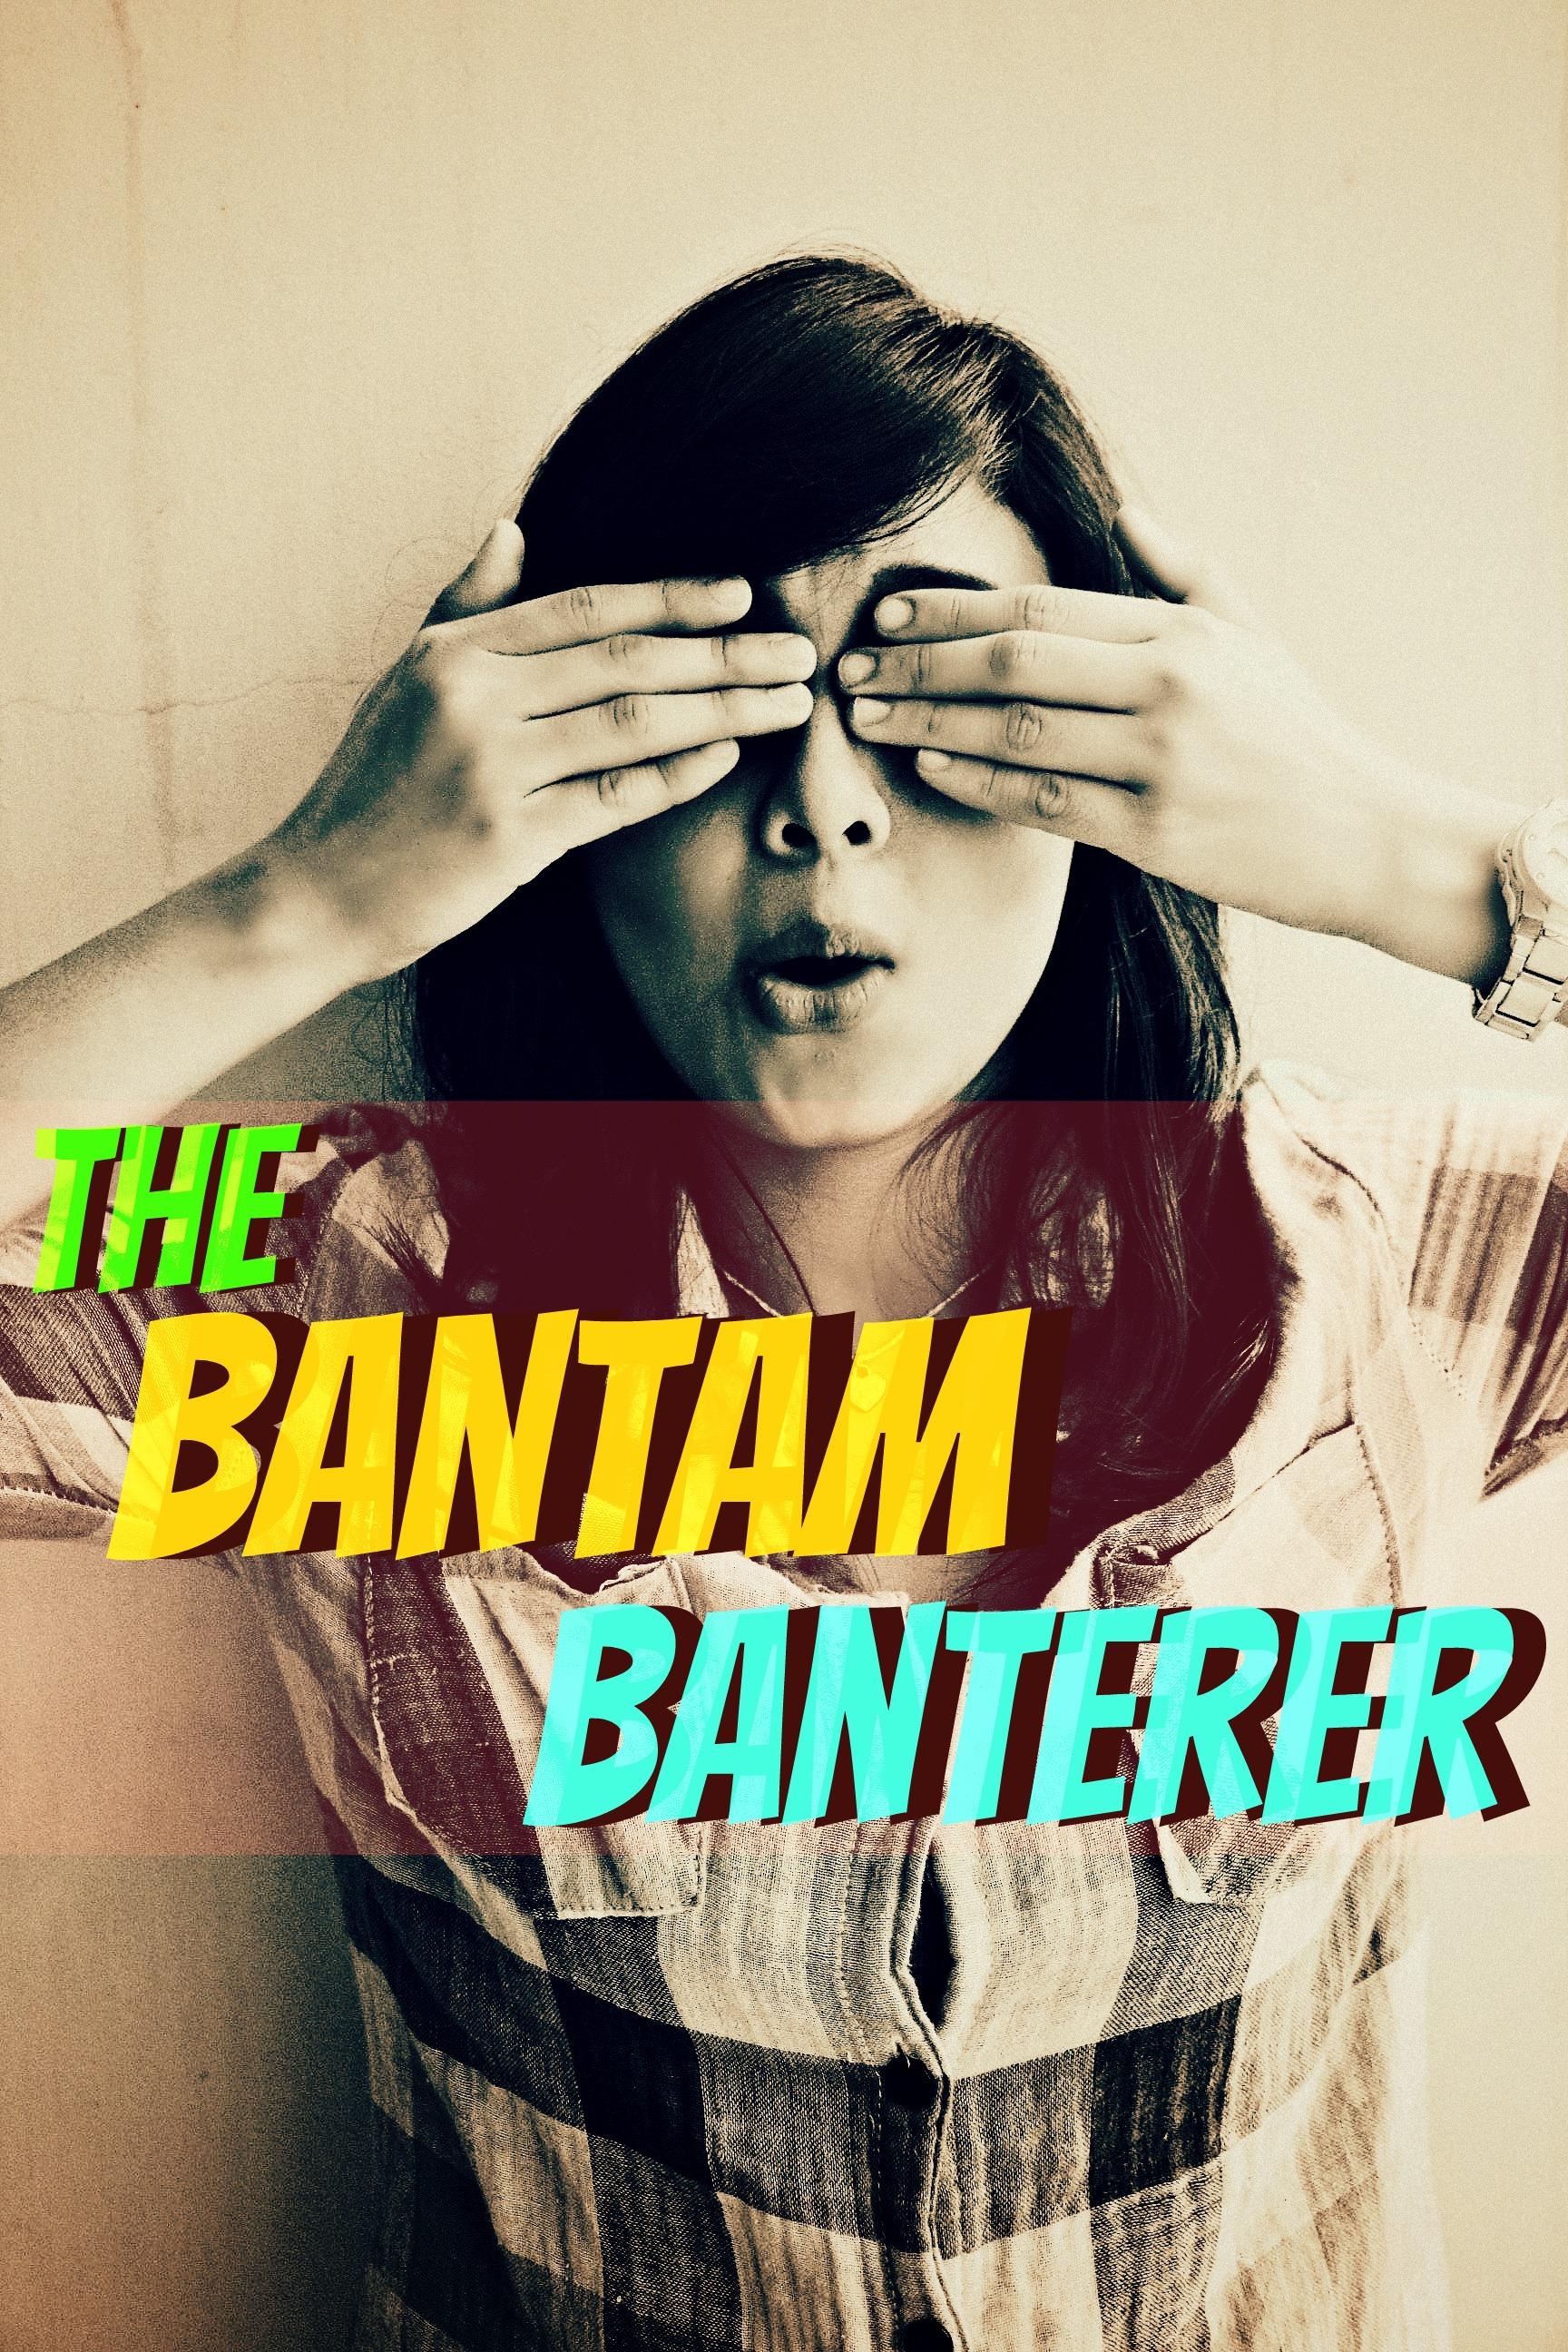 The Bantam Banterer